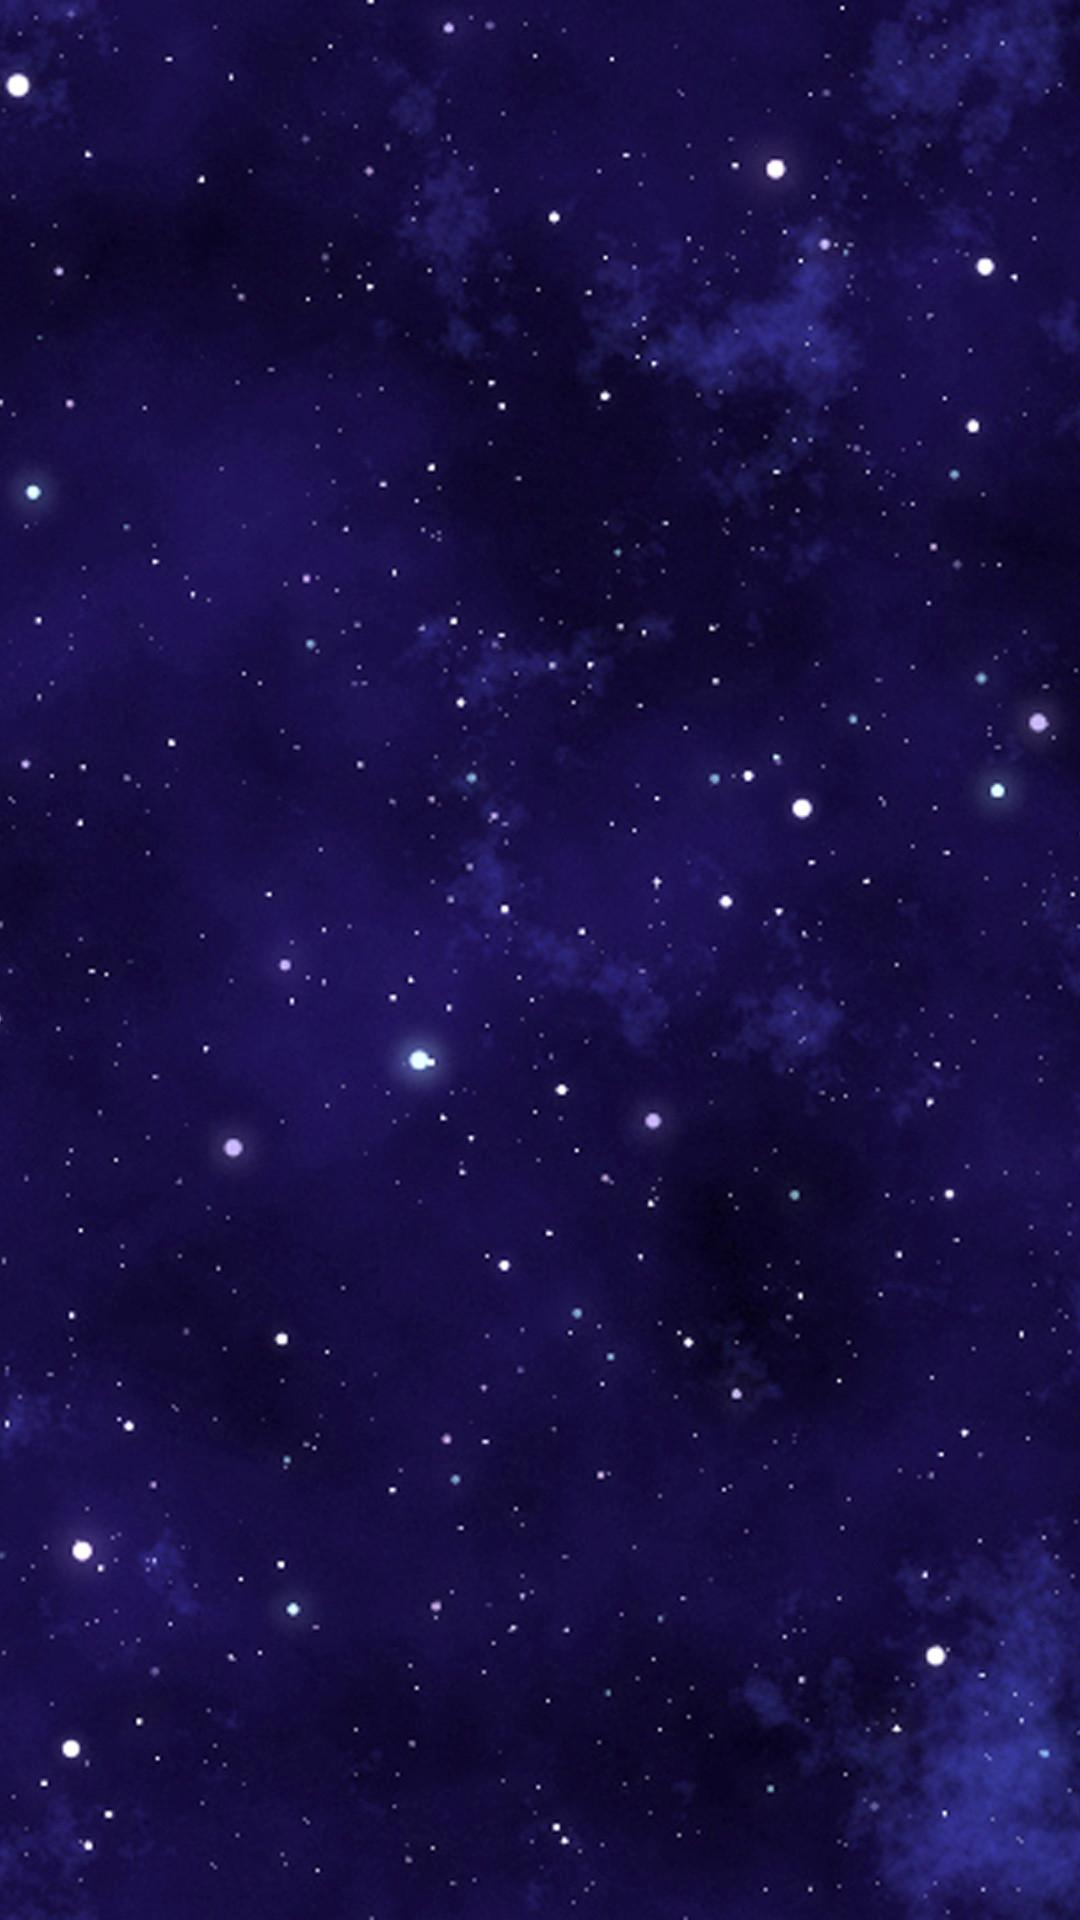 … galaxy wallpaper hd portrait 1080p image gallery hcpr …